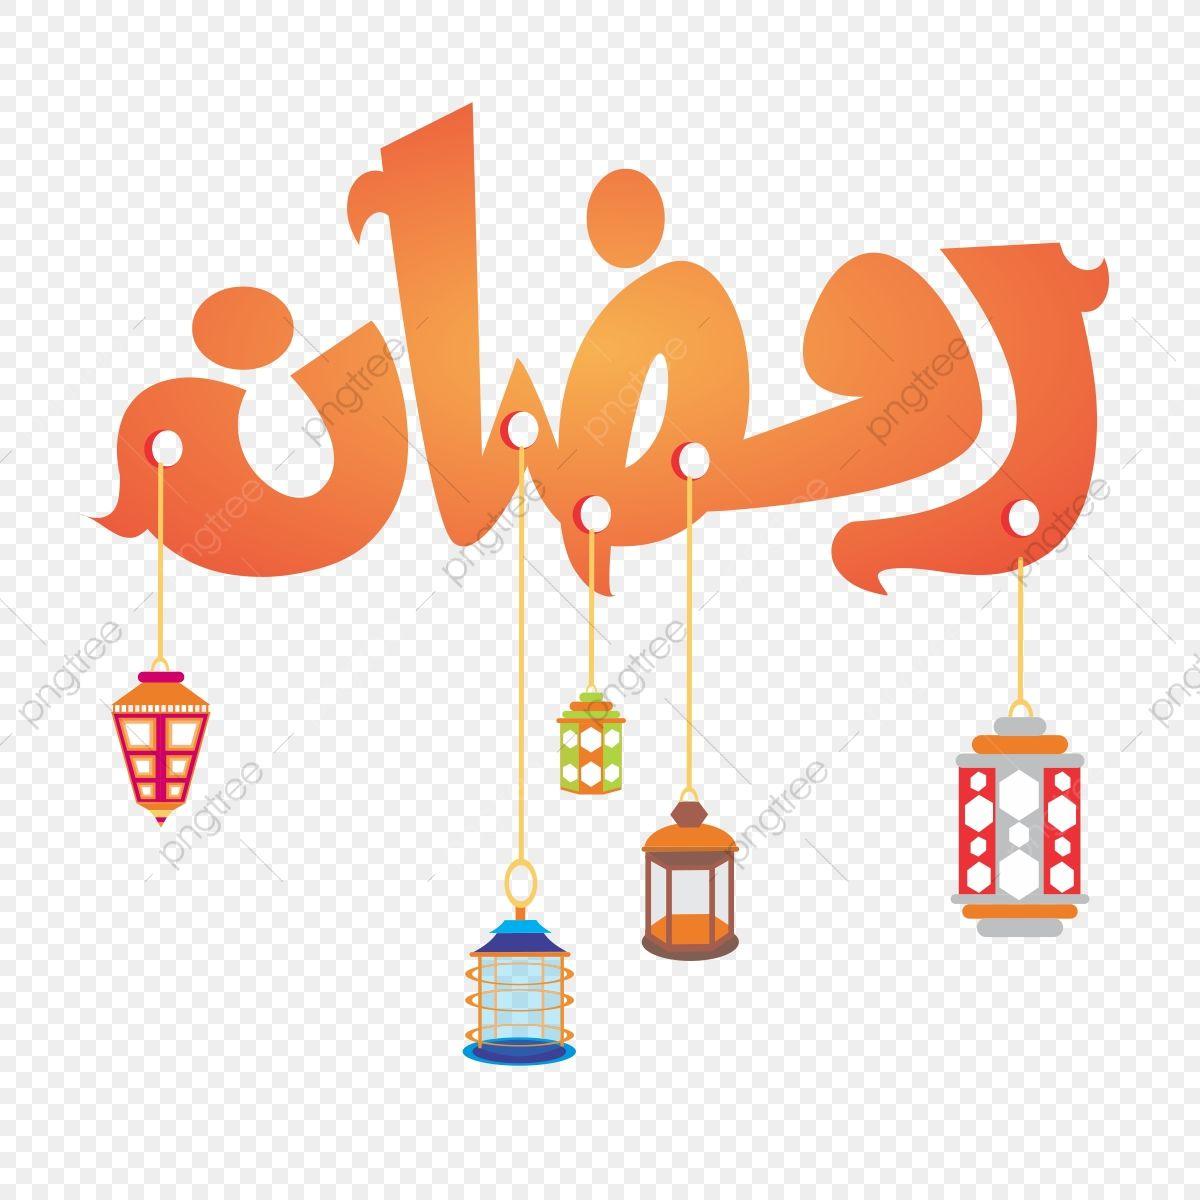 Ramadan Kareem Lantern 2018 Vector Graphics Islam Ramadan Lamp Png Transparent Image And Clipart For Free Download In 2020 Ramadan Kareem Vector Graphics Graphic